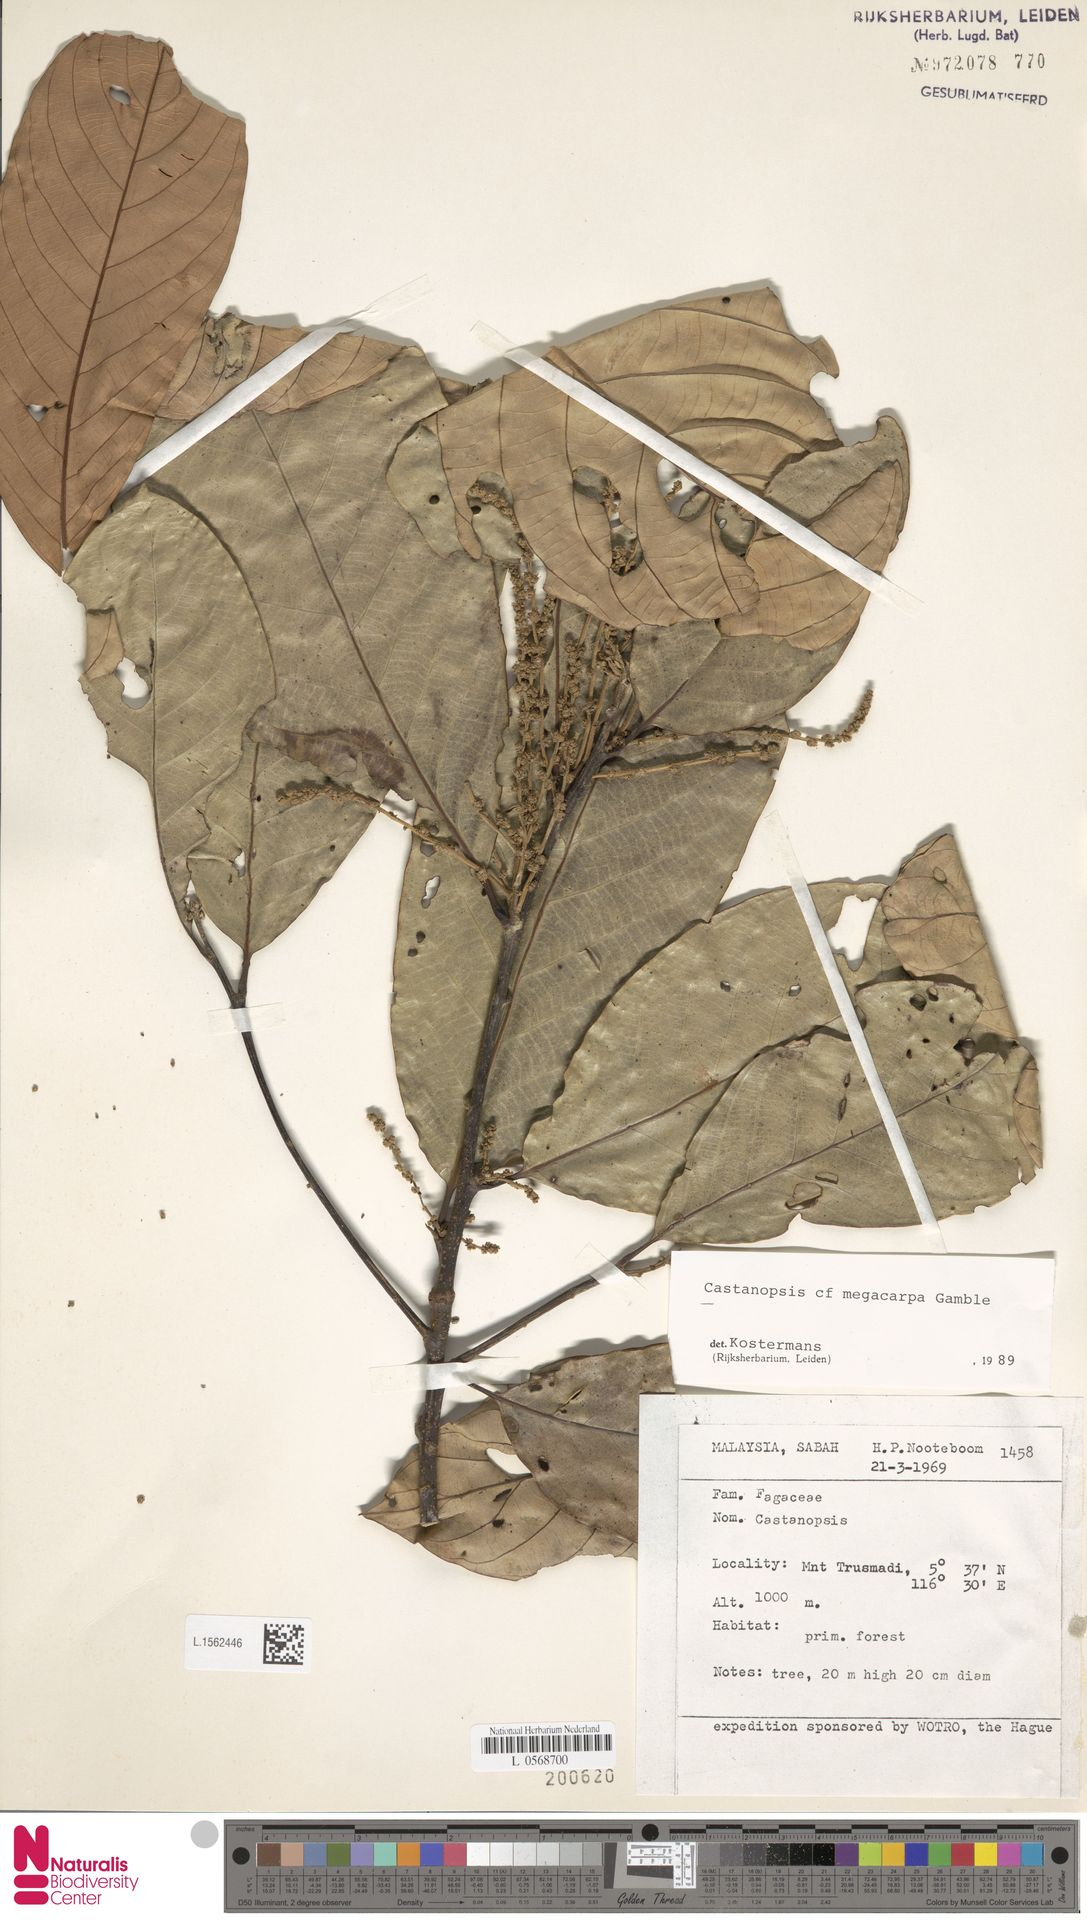 L.1562446   Castanopsis megacarpa Gamble